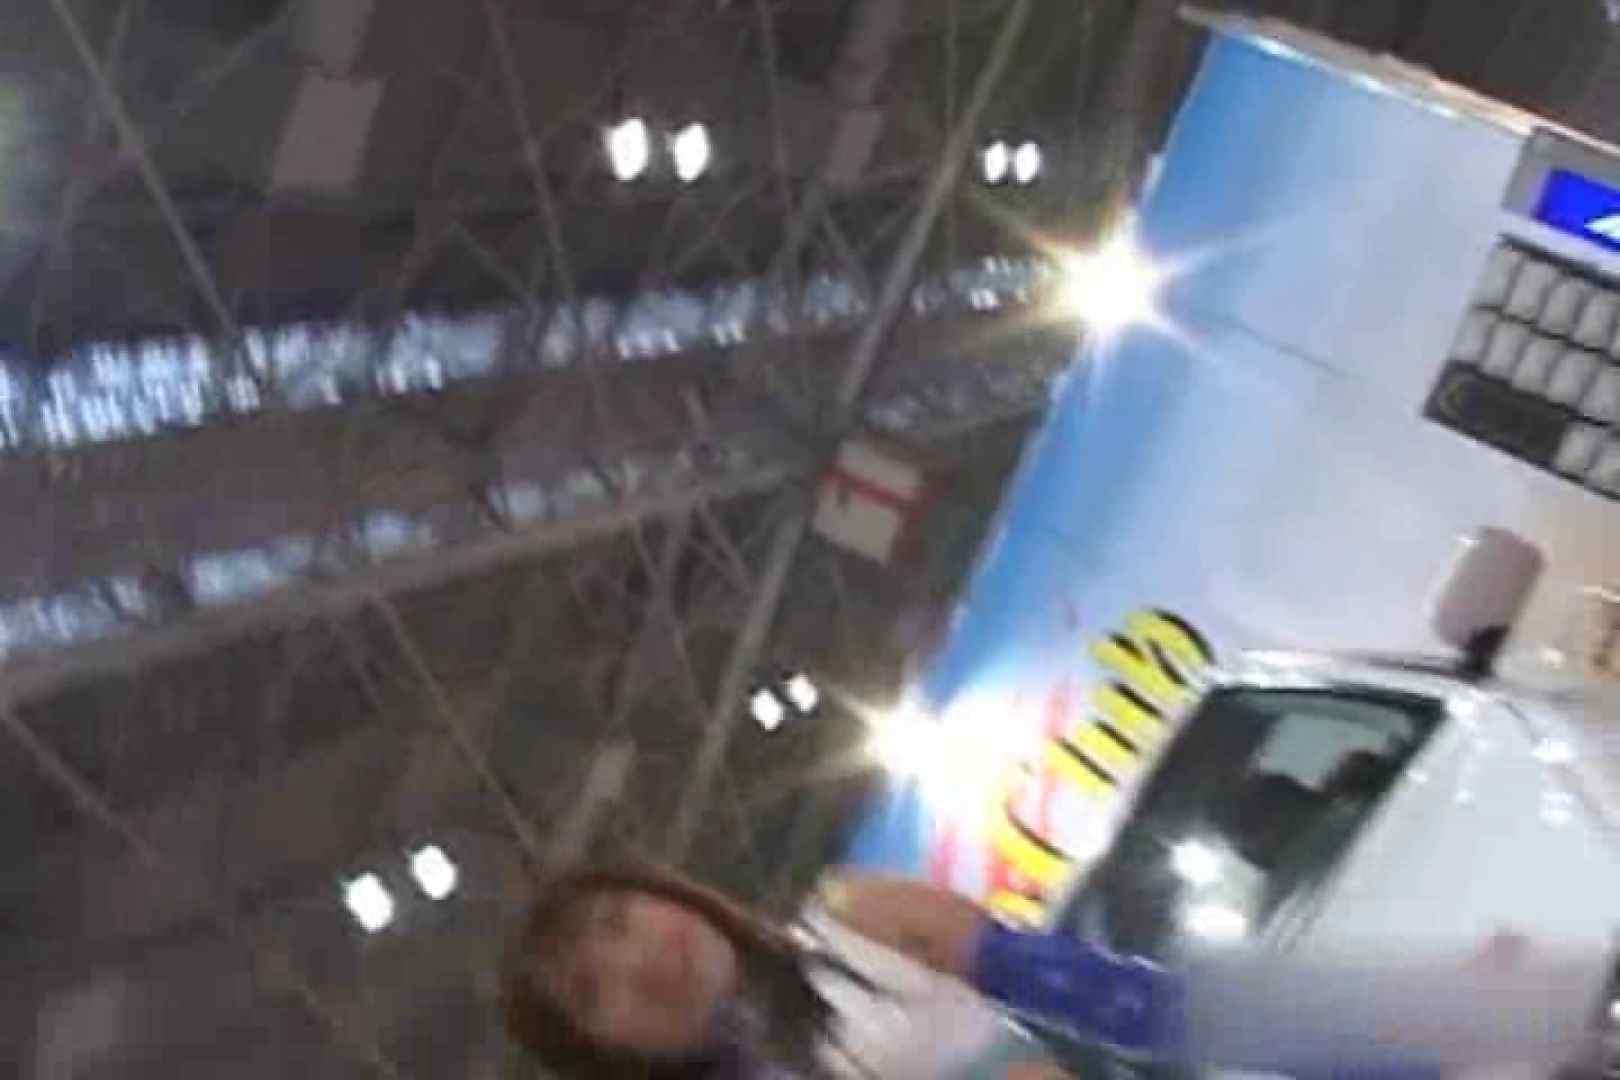 RQカメラ地獄Vol.31 ギャルのエロ動画 ヌード画像 82画像 81